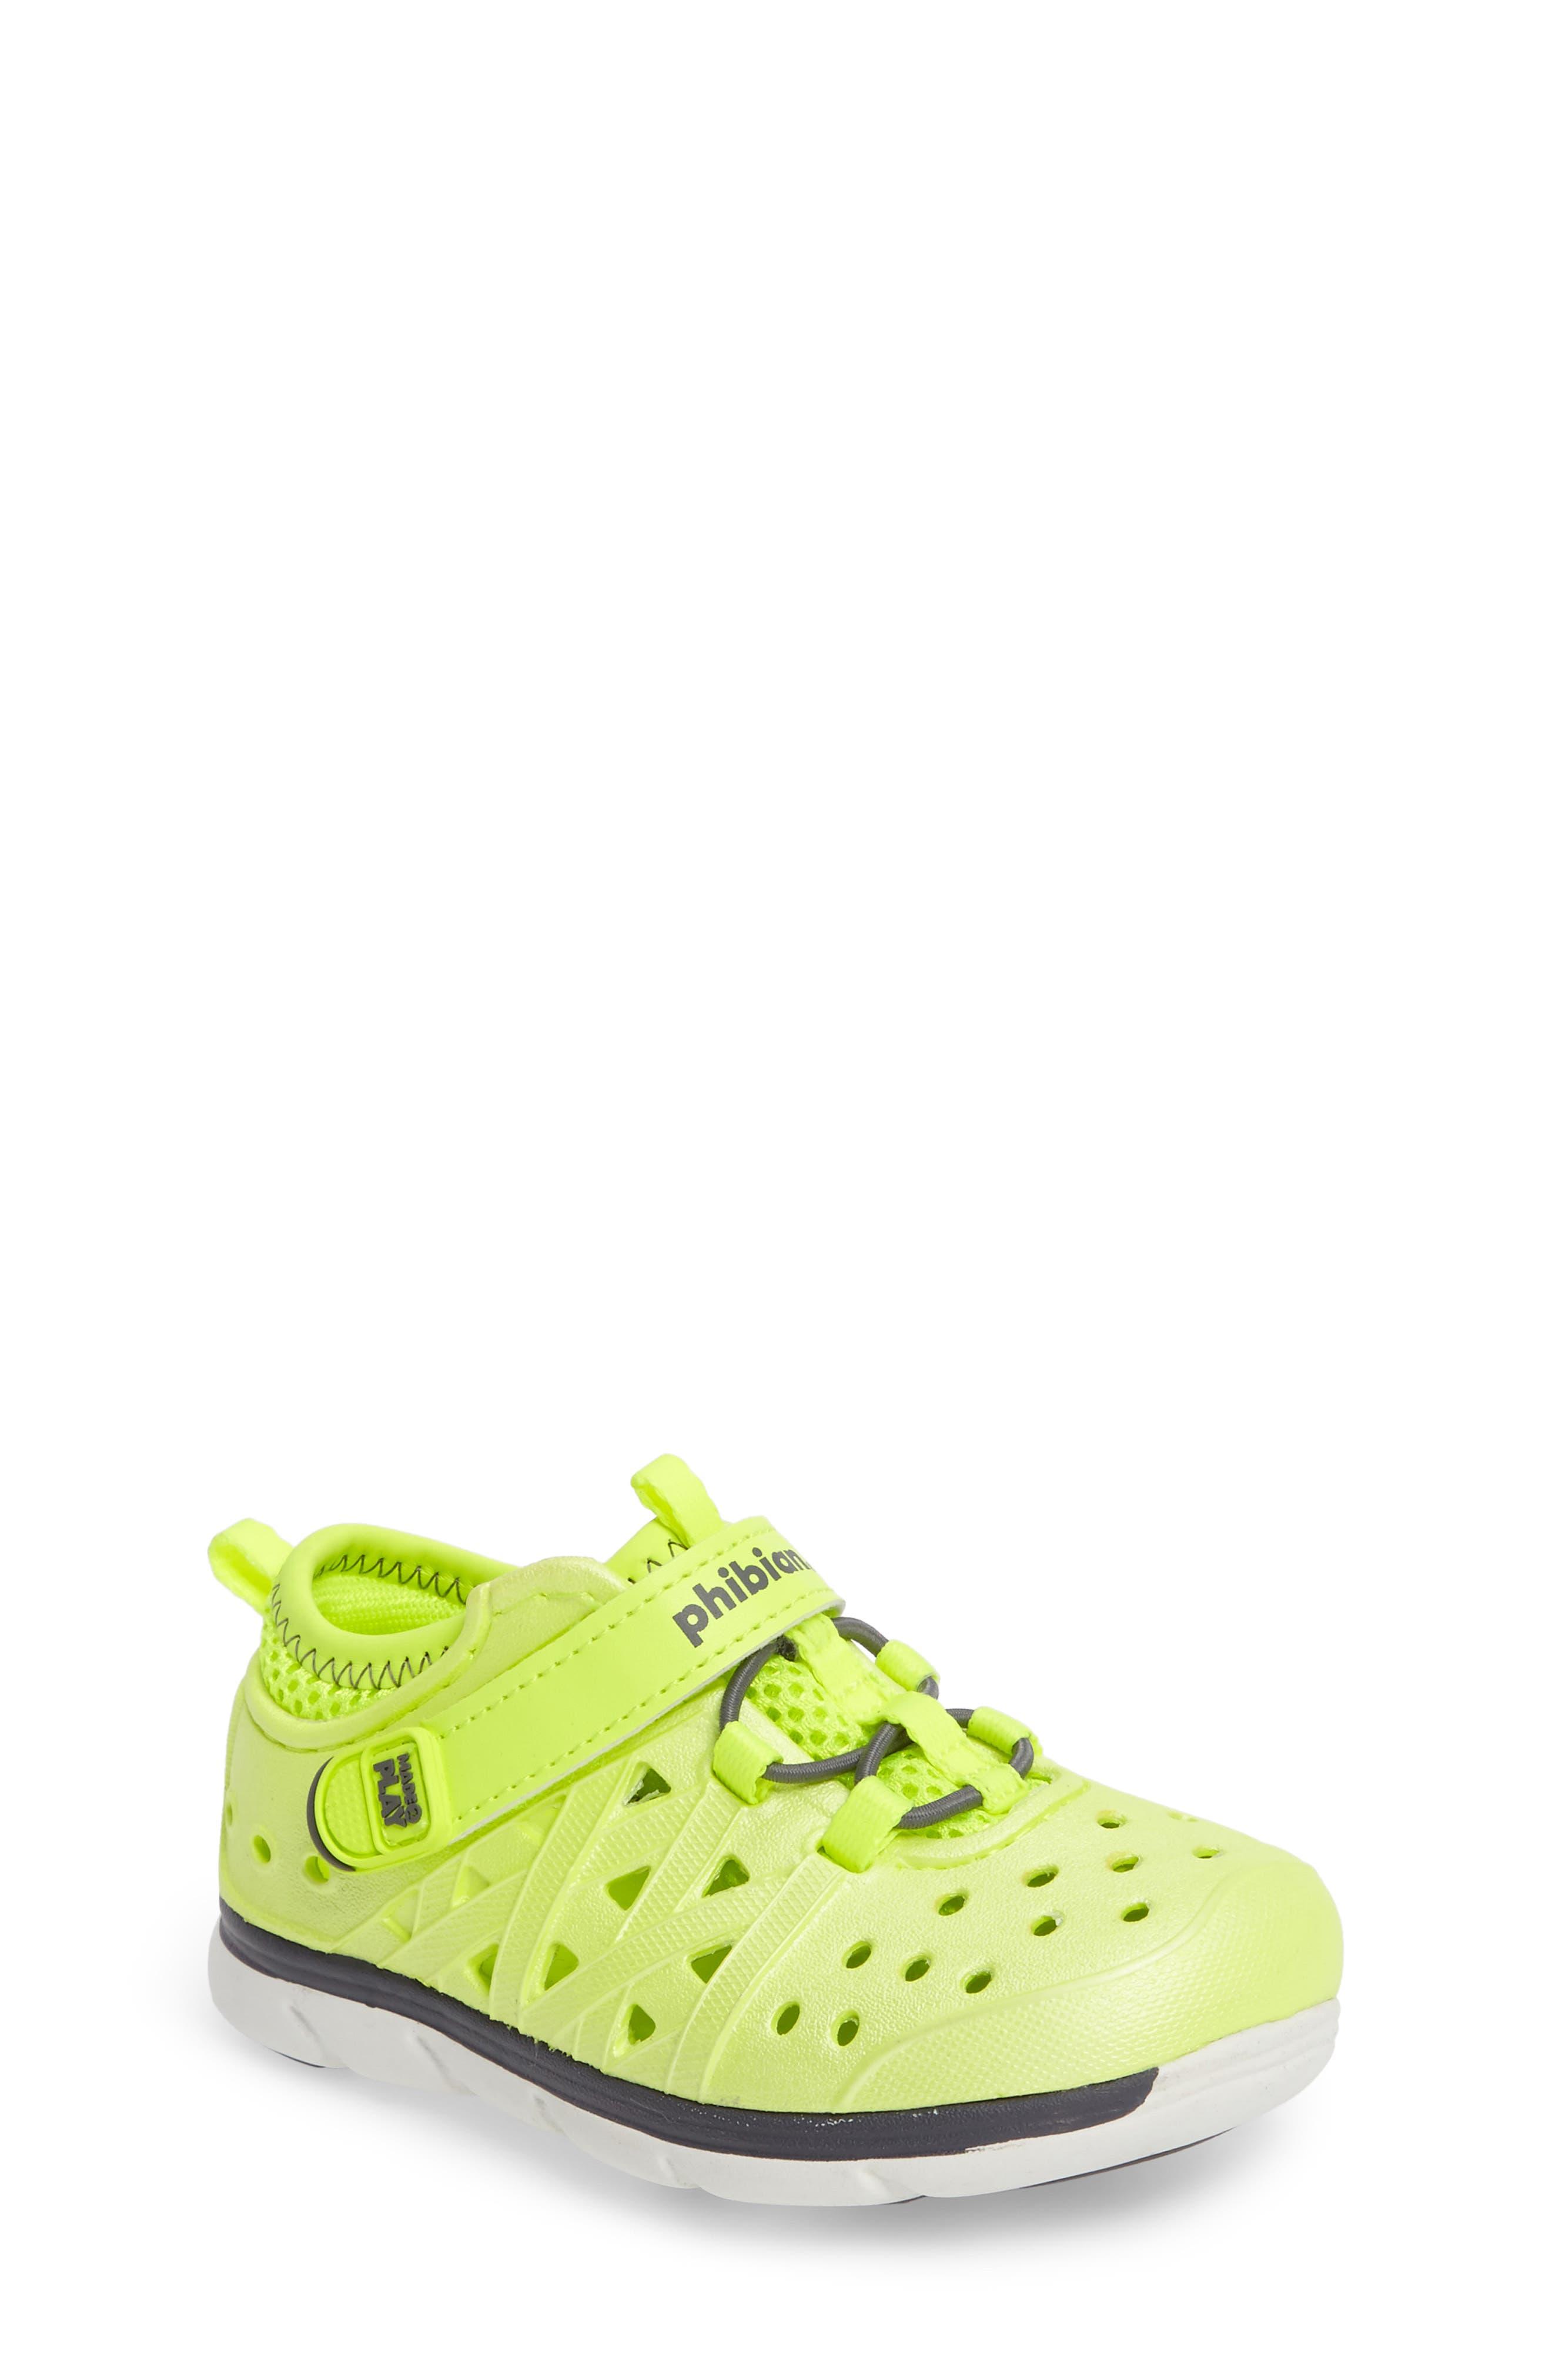 Made2Play<sup>®</sup> Phibian Sneaker,                         Main,                         color, Citron Metallic